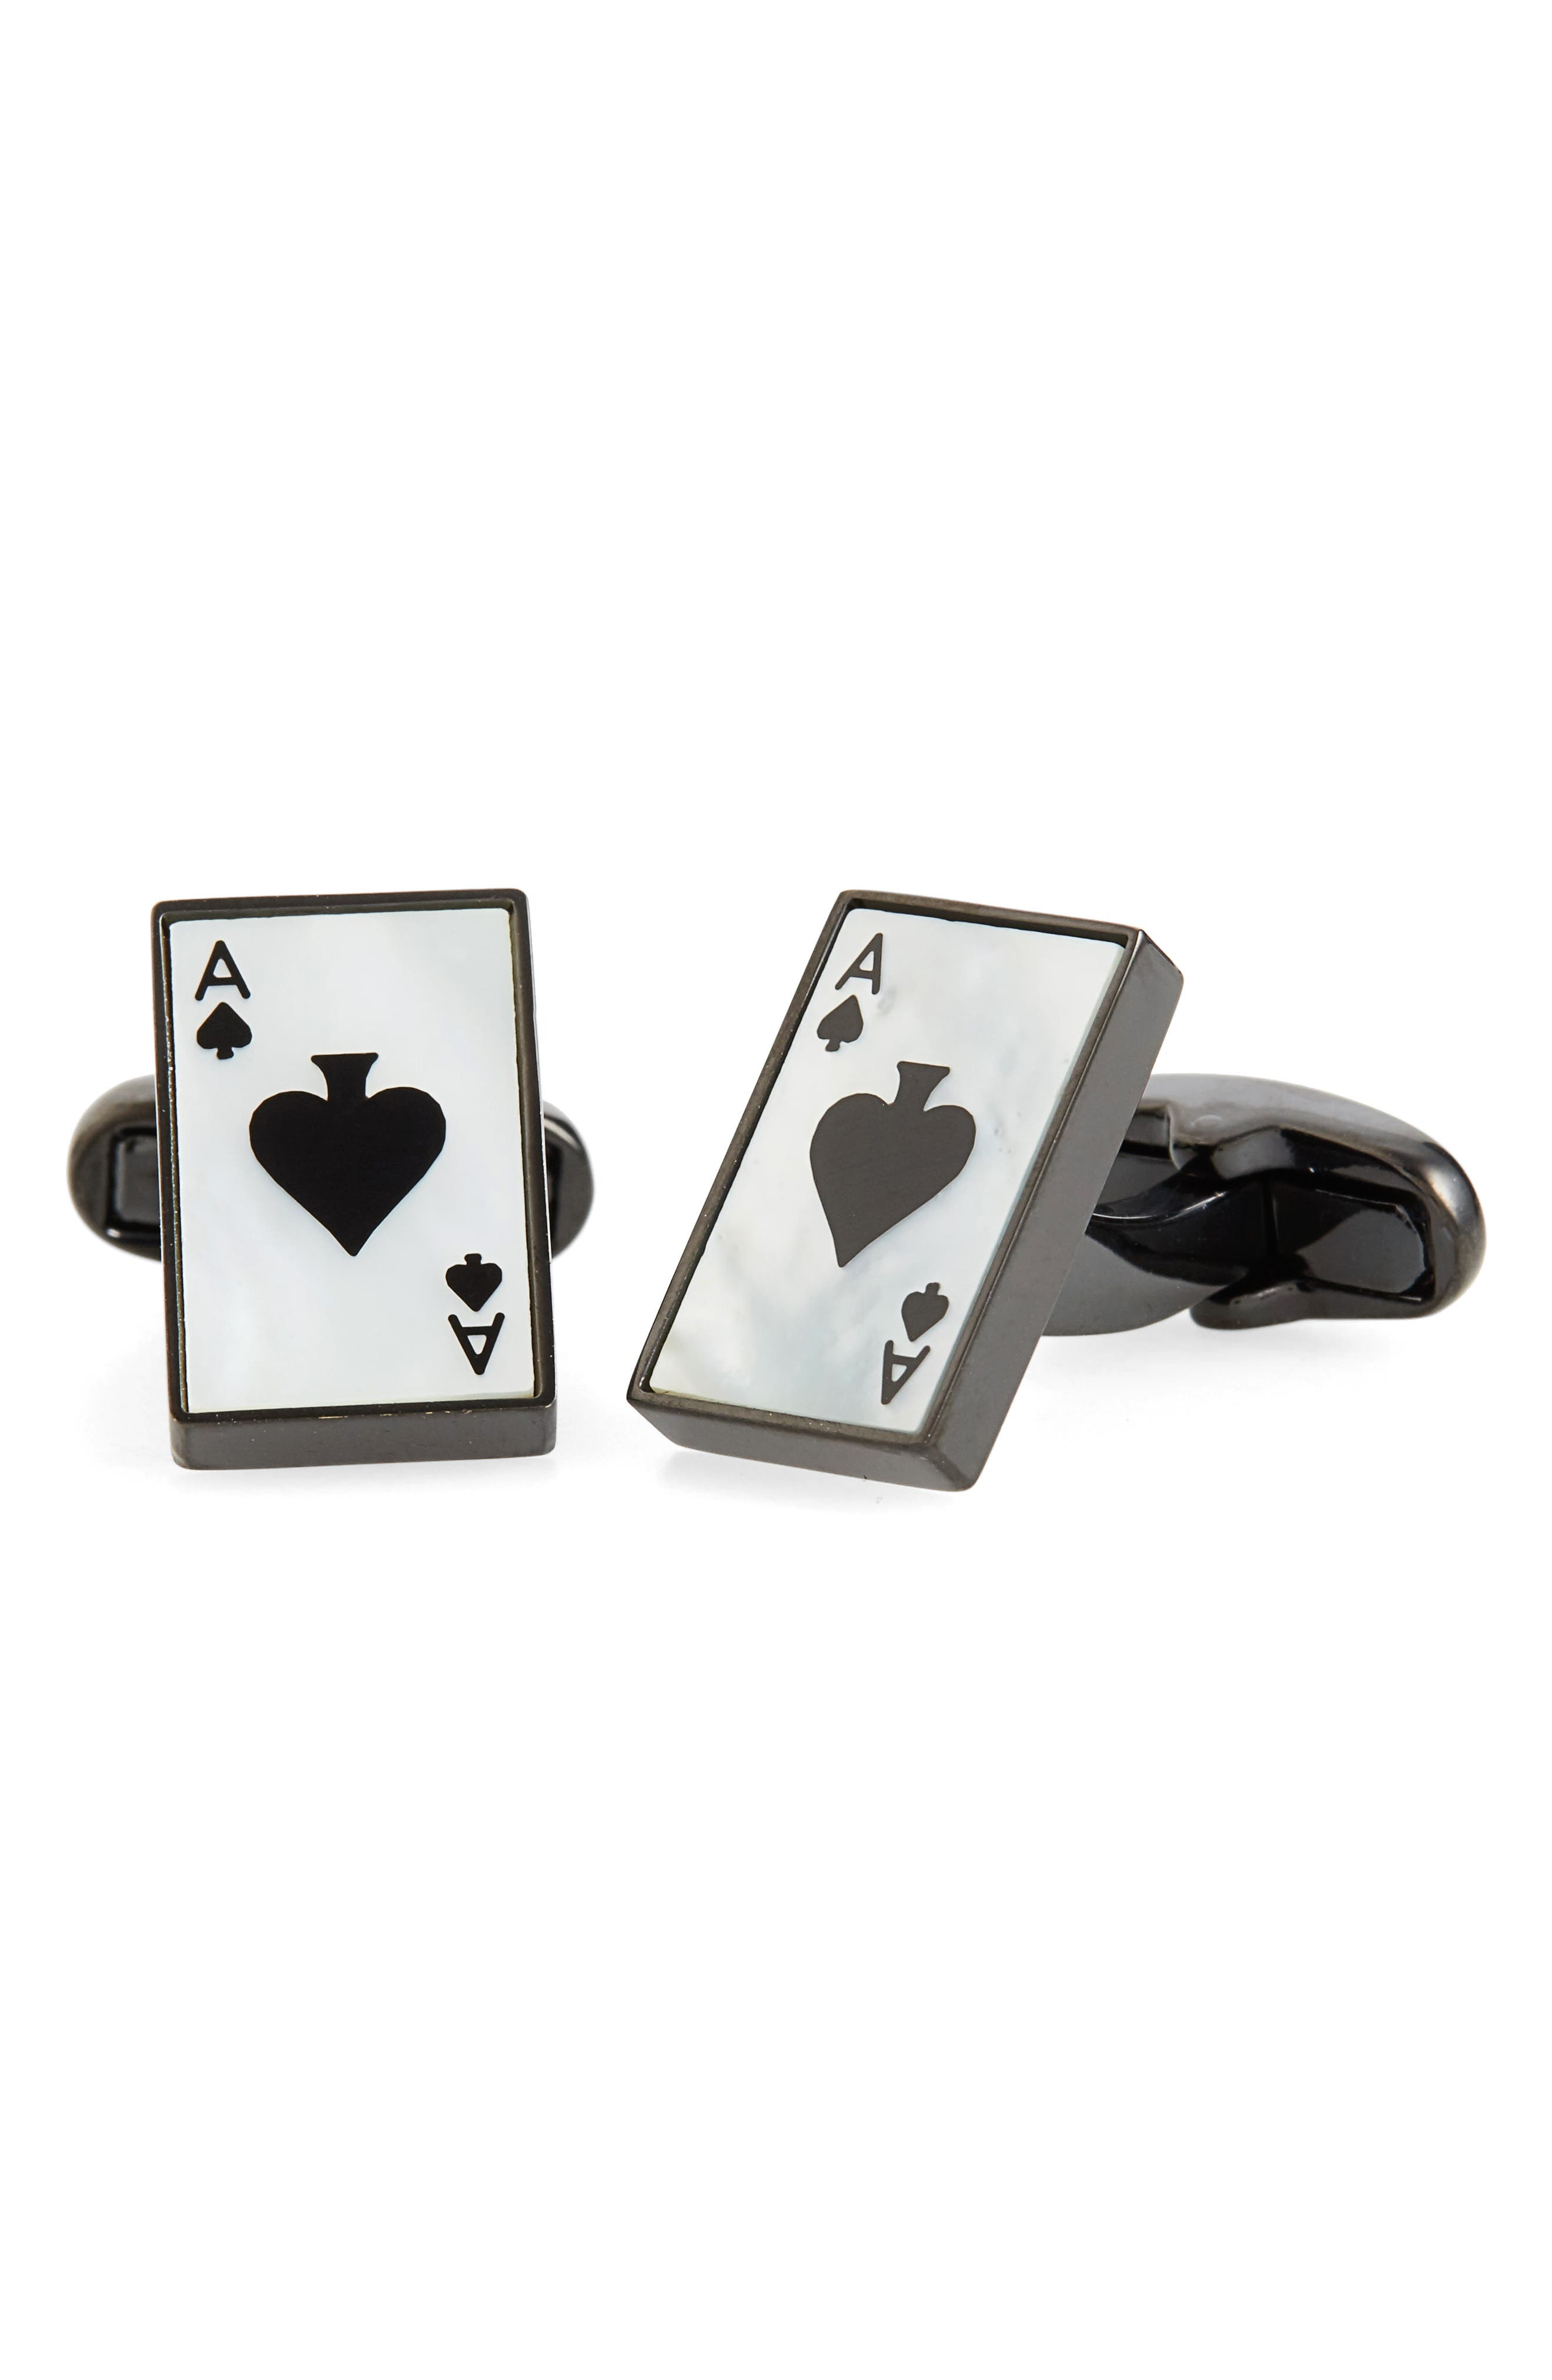 Paul Smith Ace of Spade Cuff Links